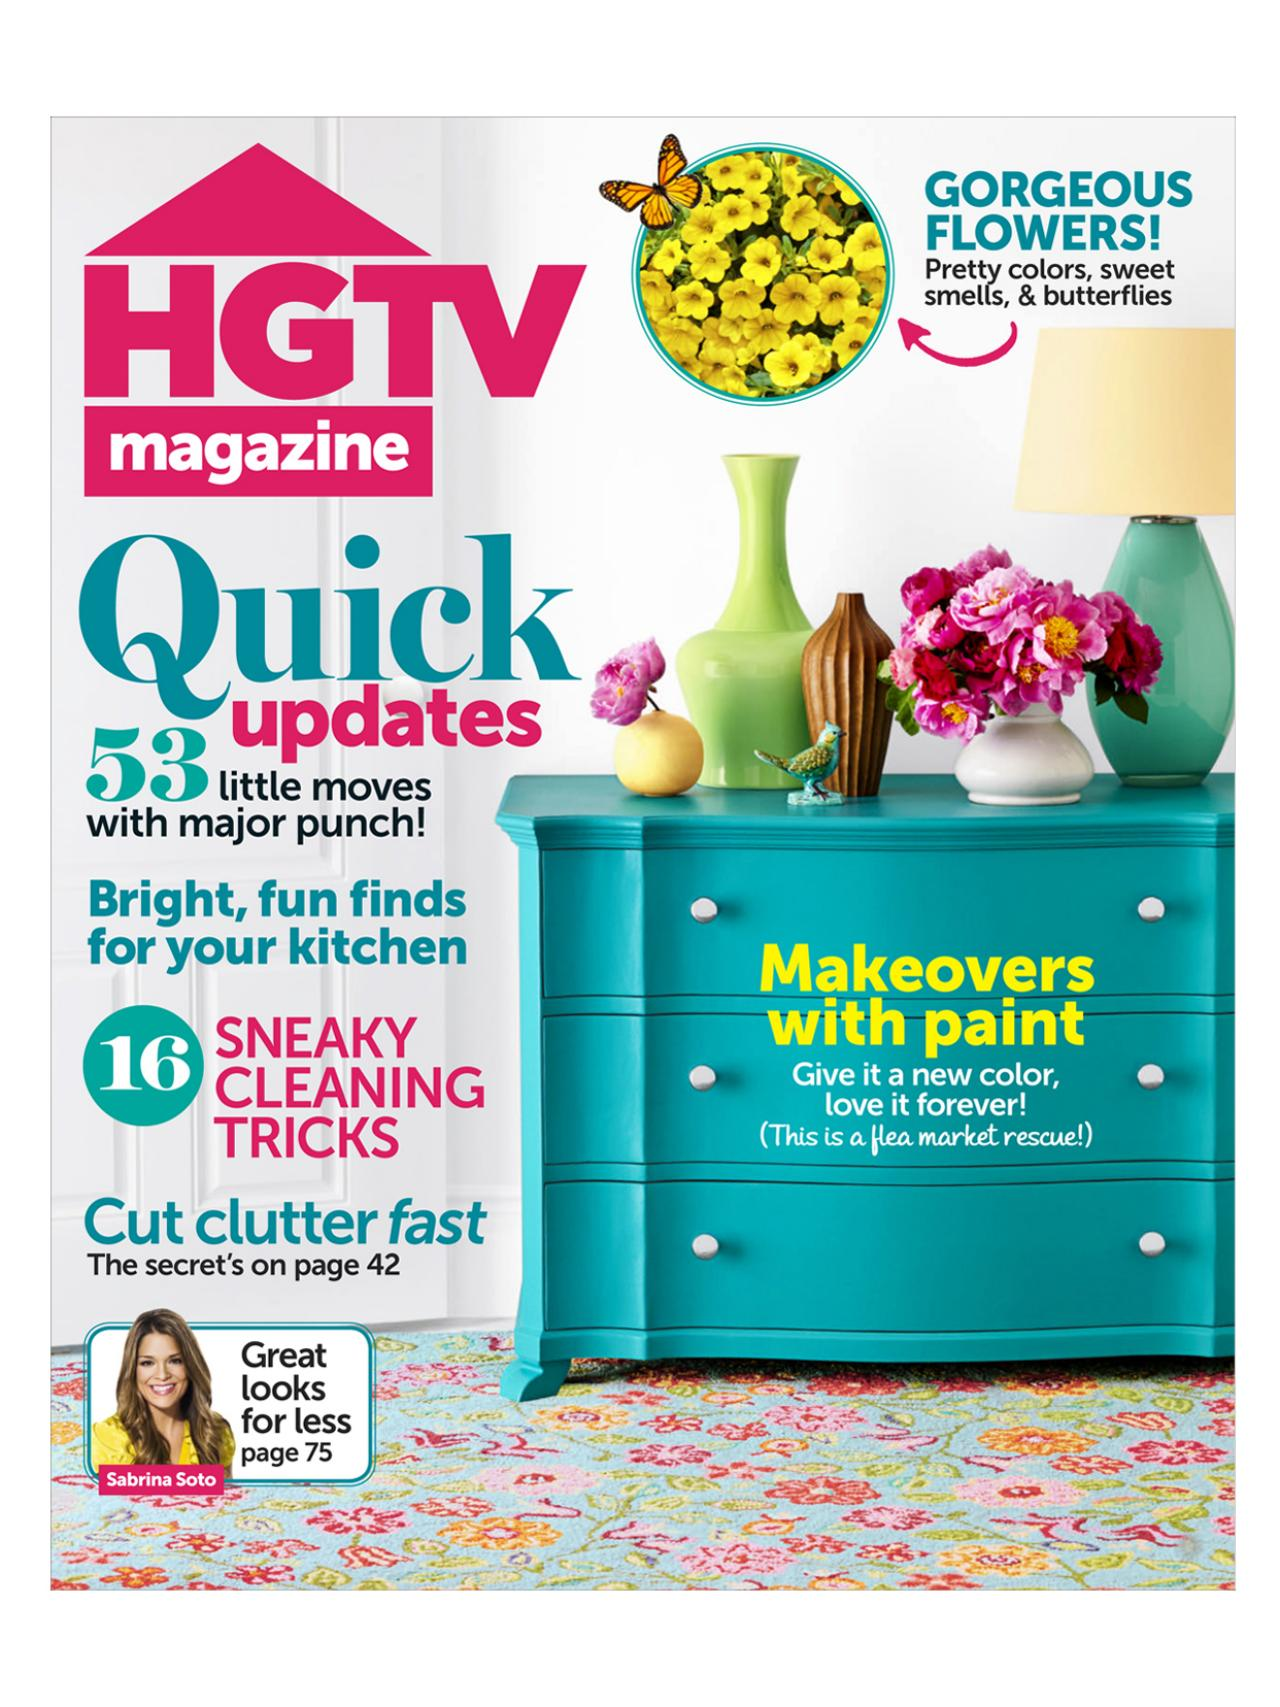 HGTV Magazine: April 2013 | HGTV